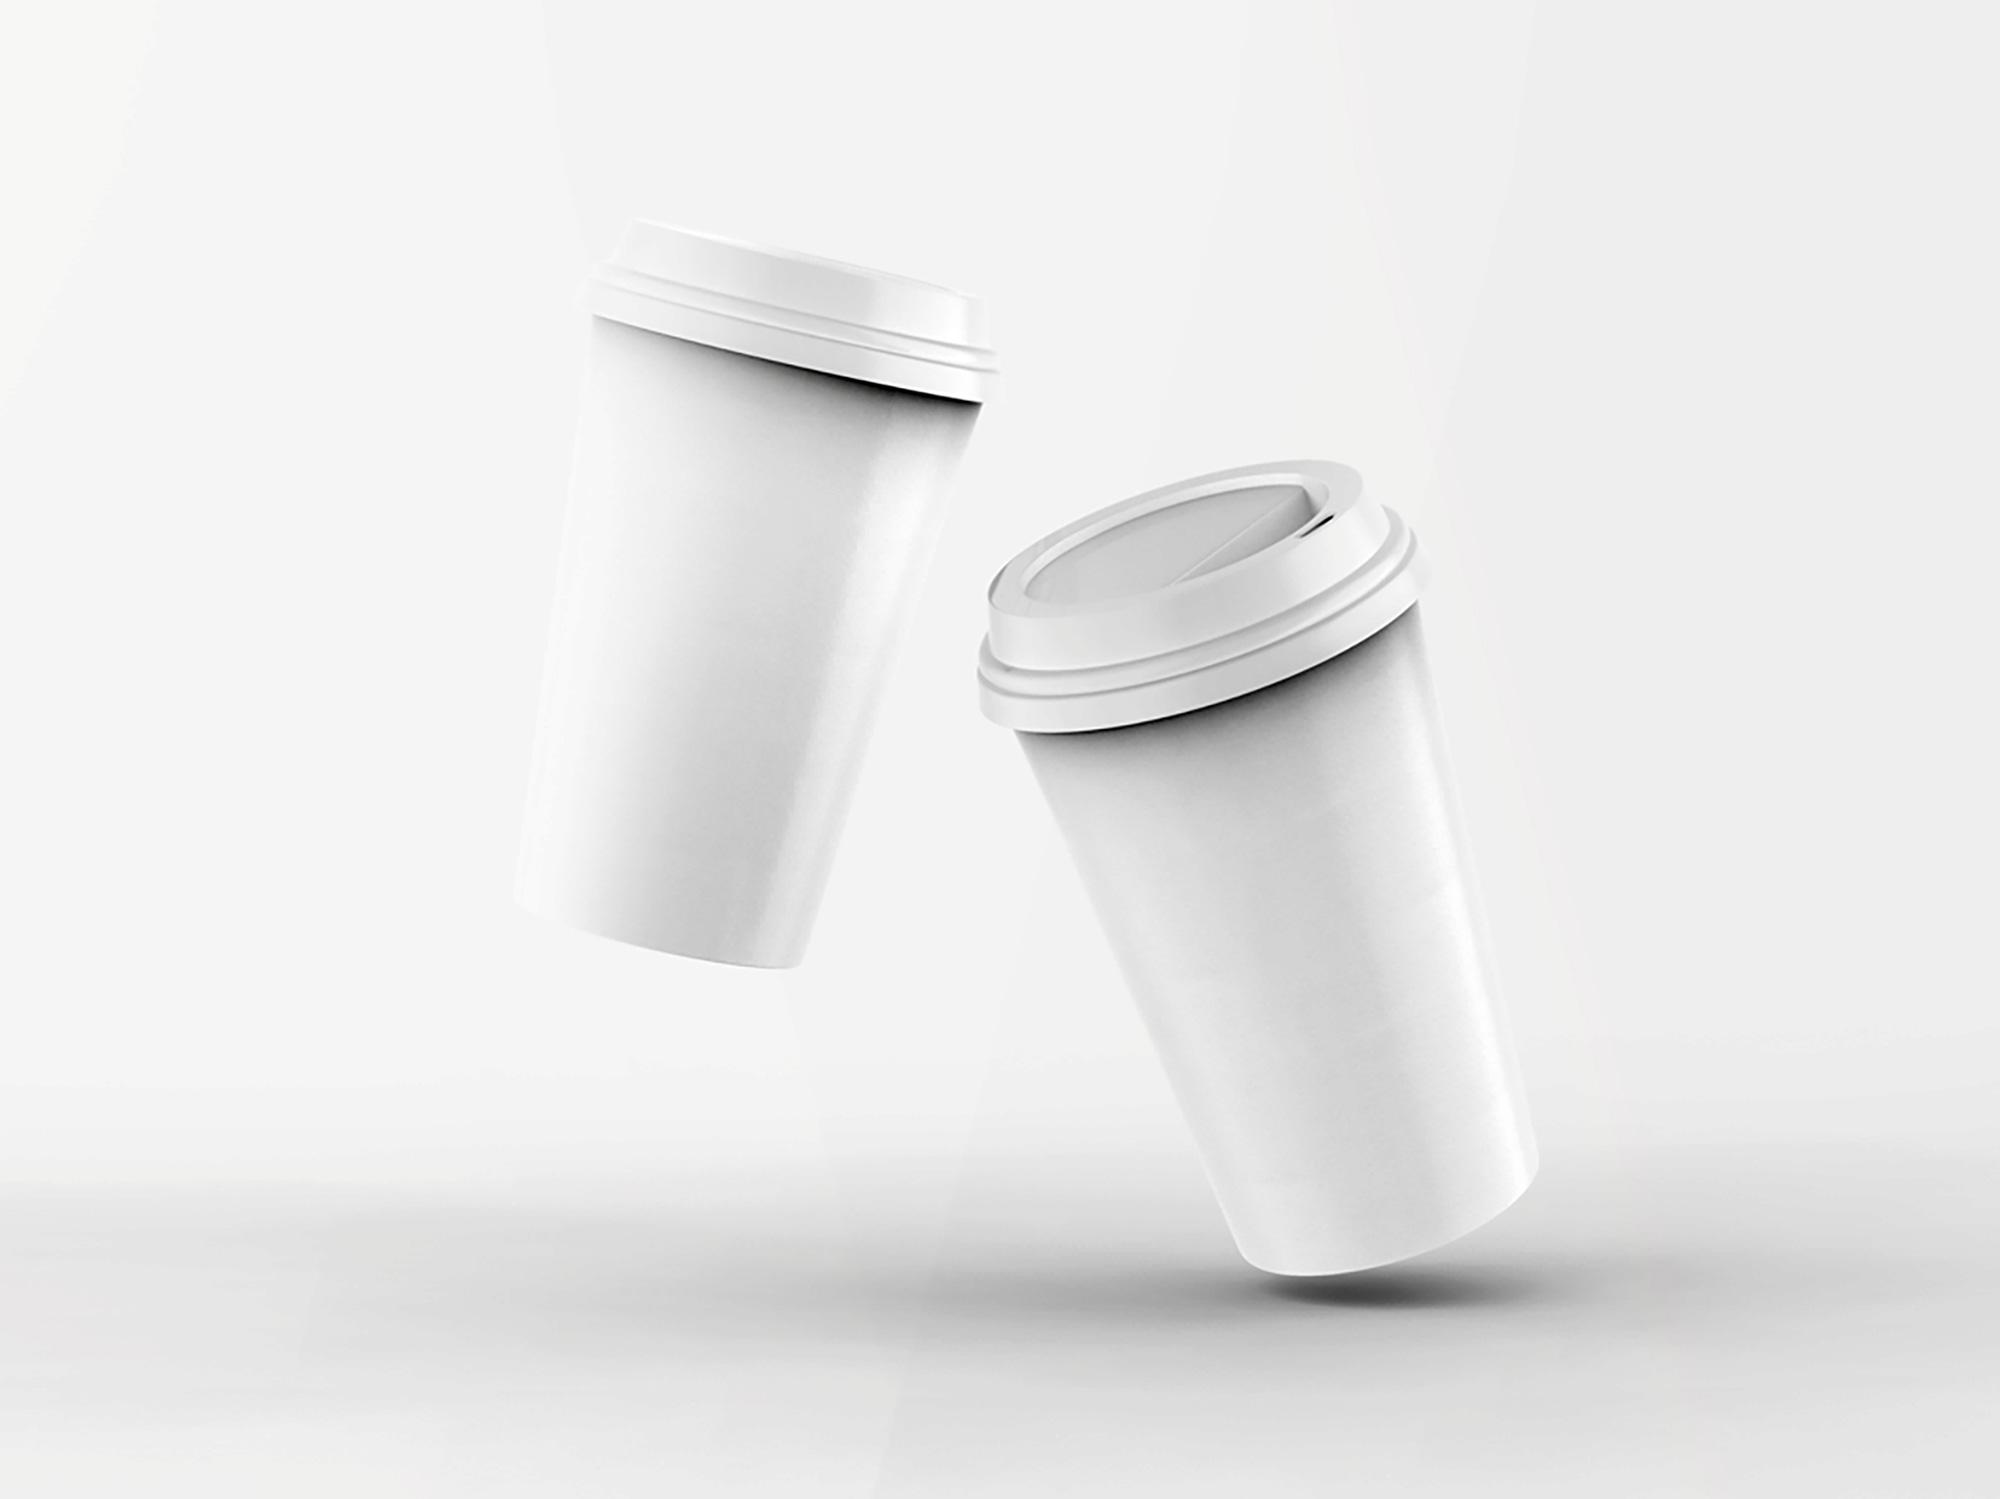 2 Floating Coffee Cups Mockup 2